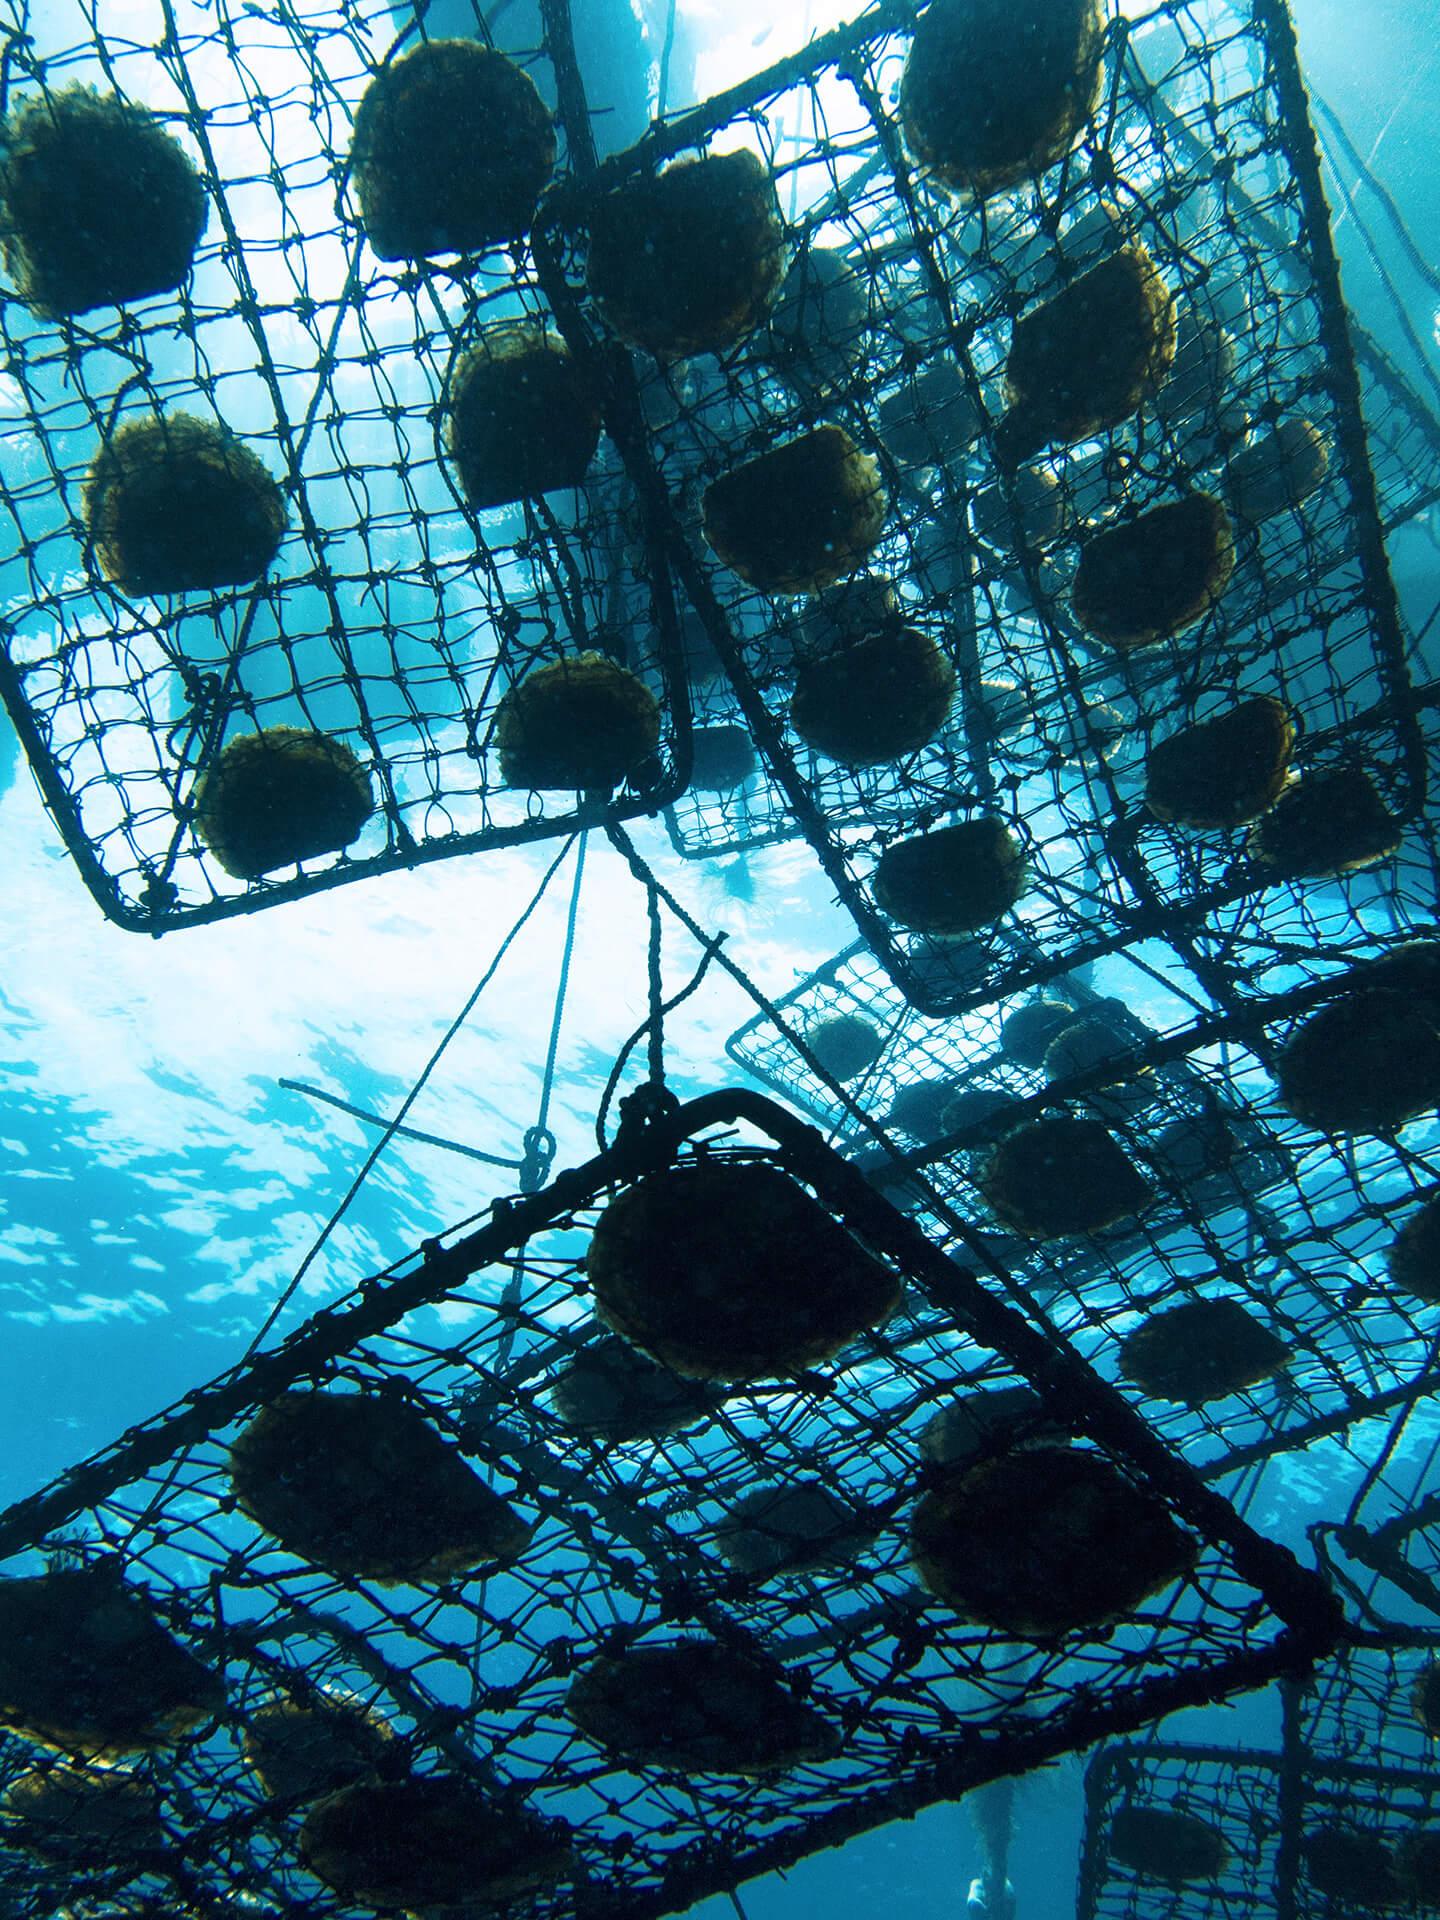 Treasure Island - Culturing South Sea Pearls